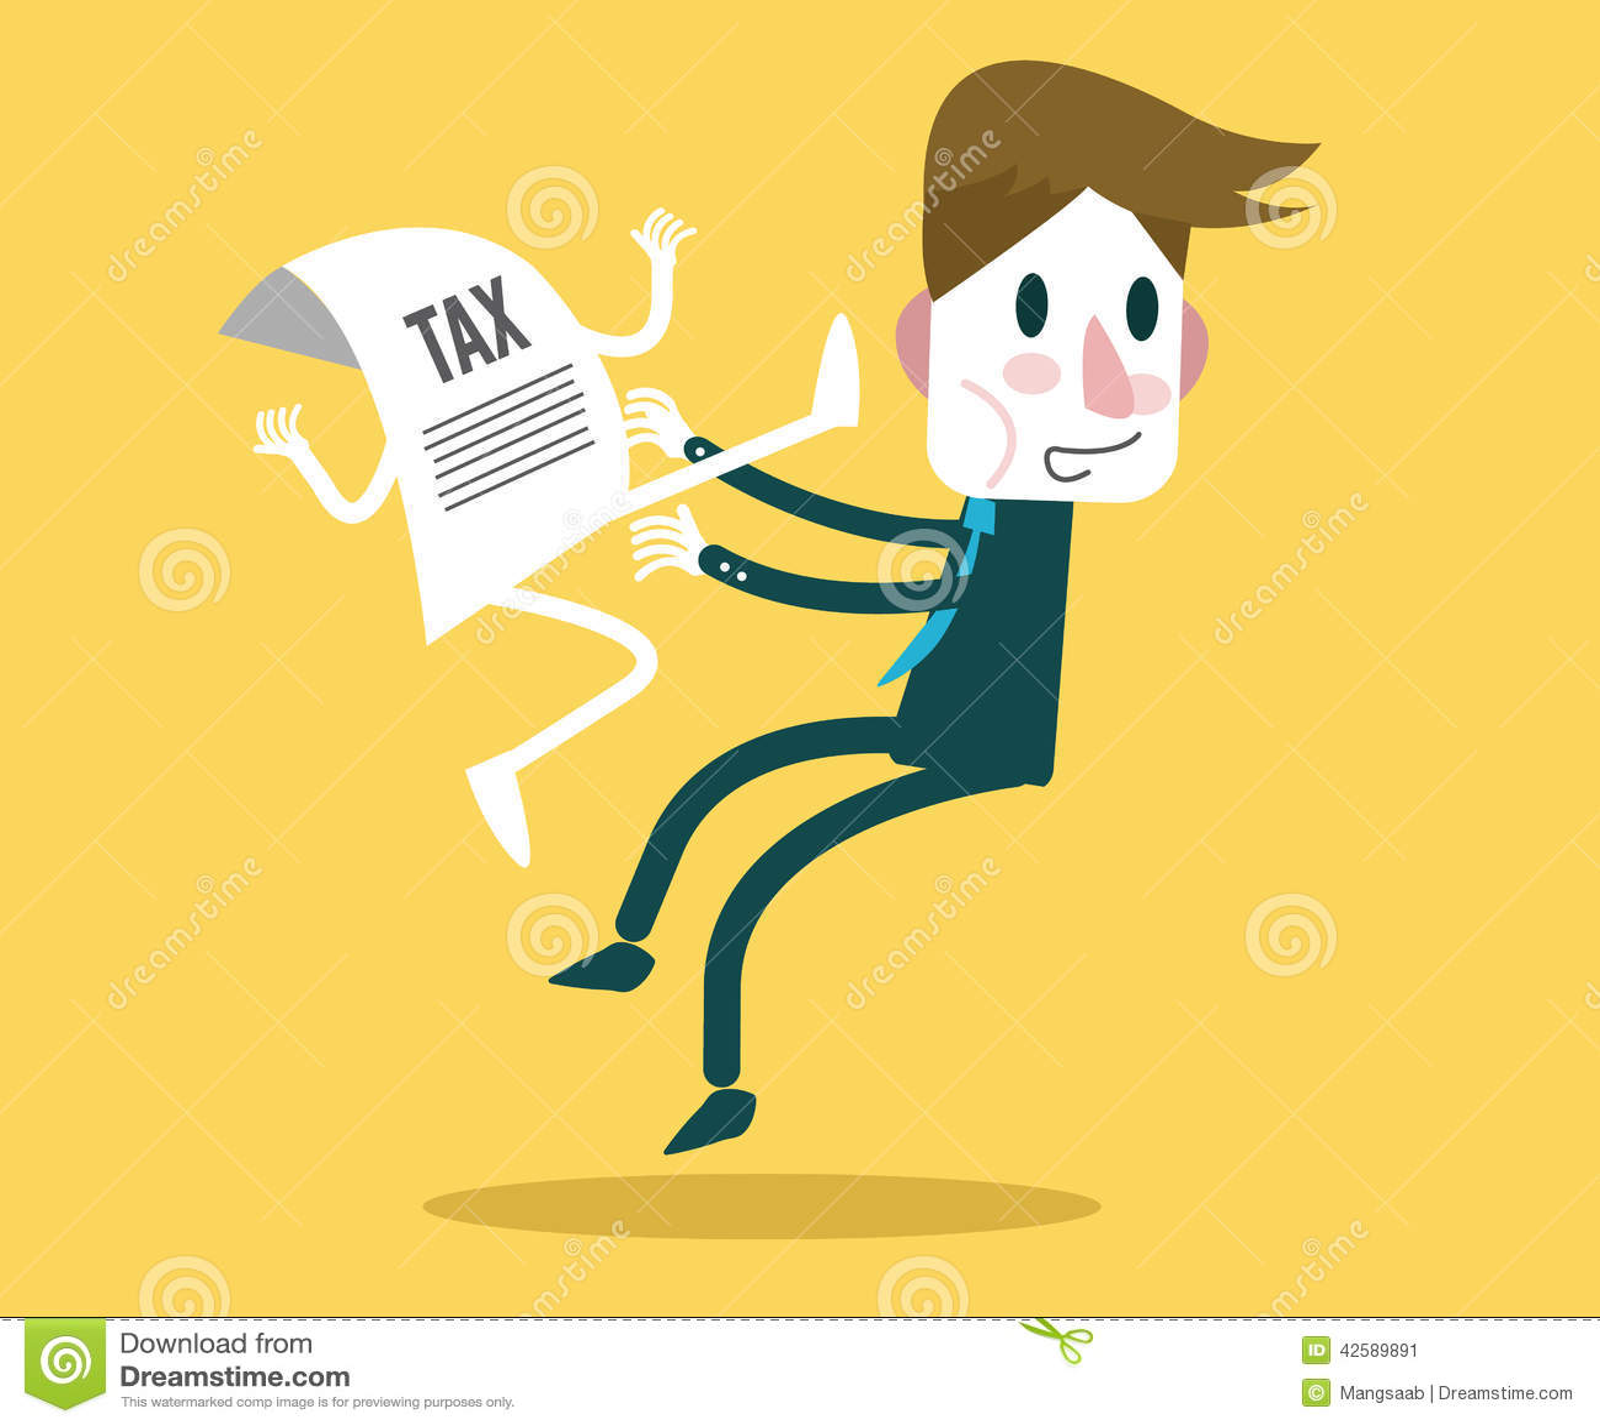 TAX document jump kick businessman. Tax Burden concept design.